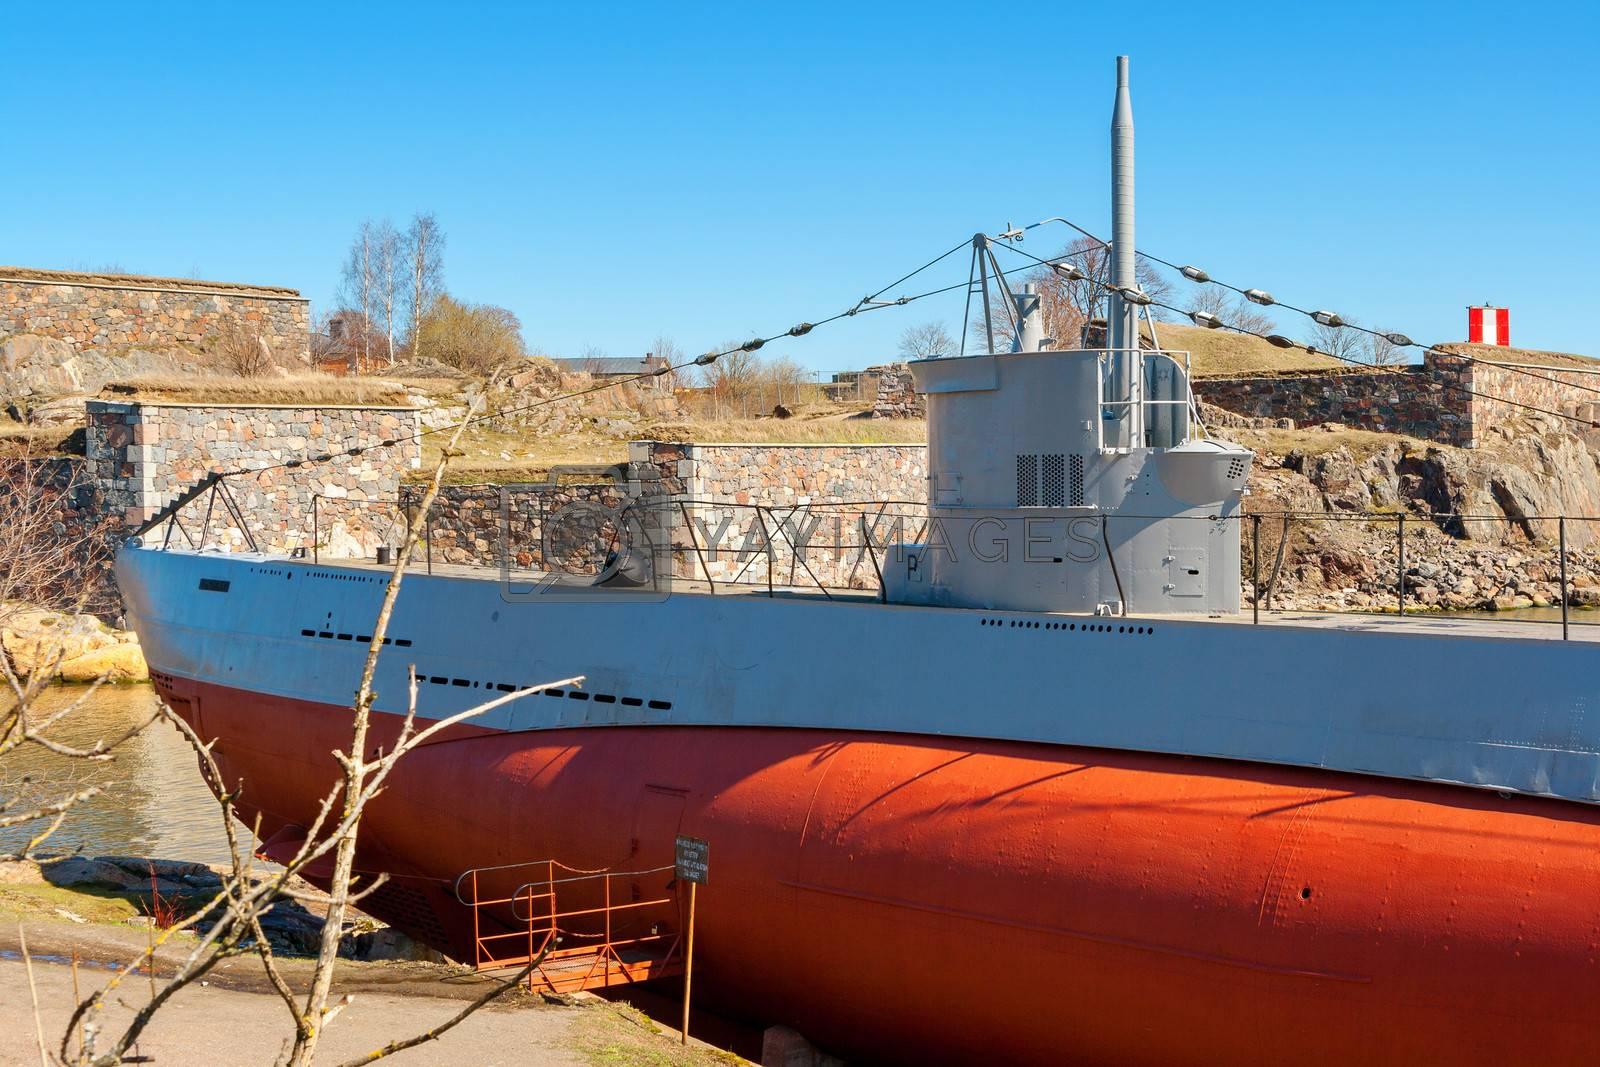 Submarine Vesikko at Suomenlinna maritime fortress. Helsinki, Finland